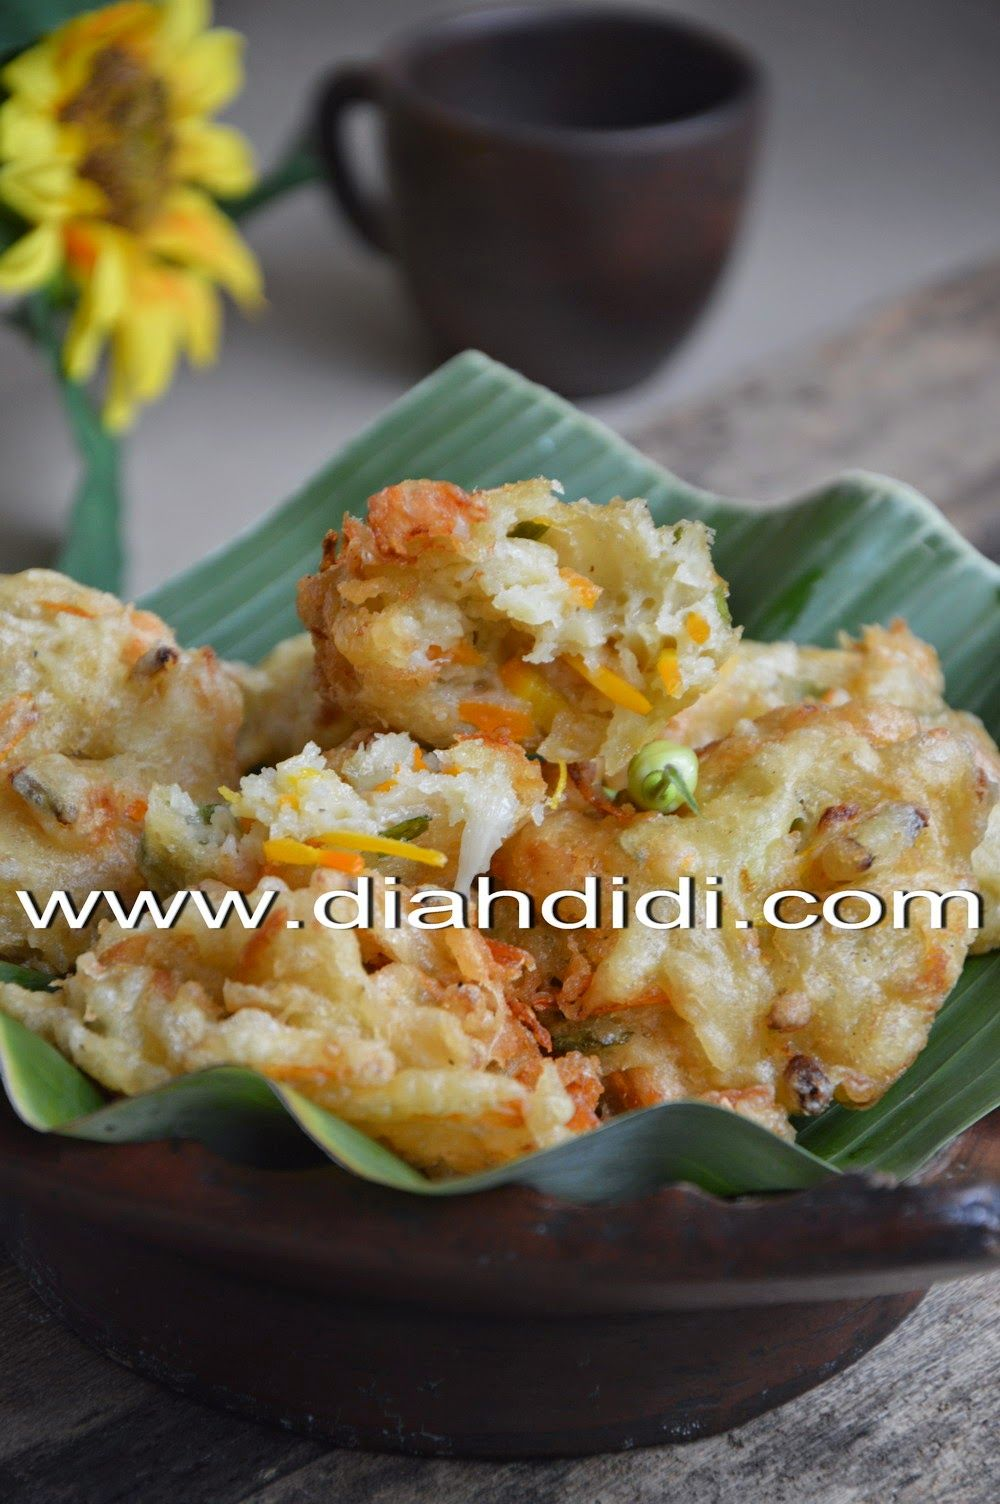 Diah Didi S Kitchen Bakwan Jamur Tiram Udang Makanan Dan Minuman Resep Masakan Indonesia Masakan Indonesia